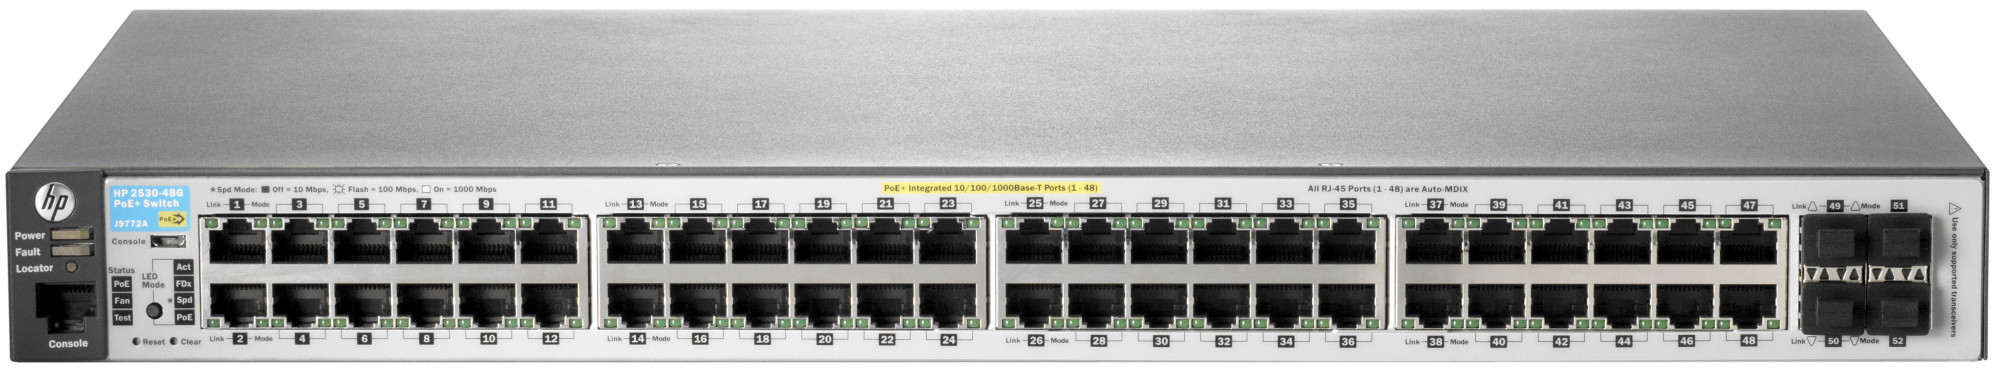 Коммутатор HP 2530-48G